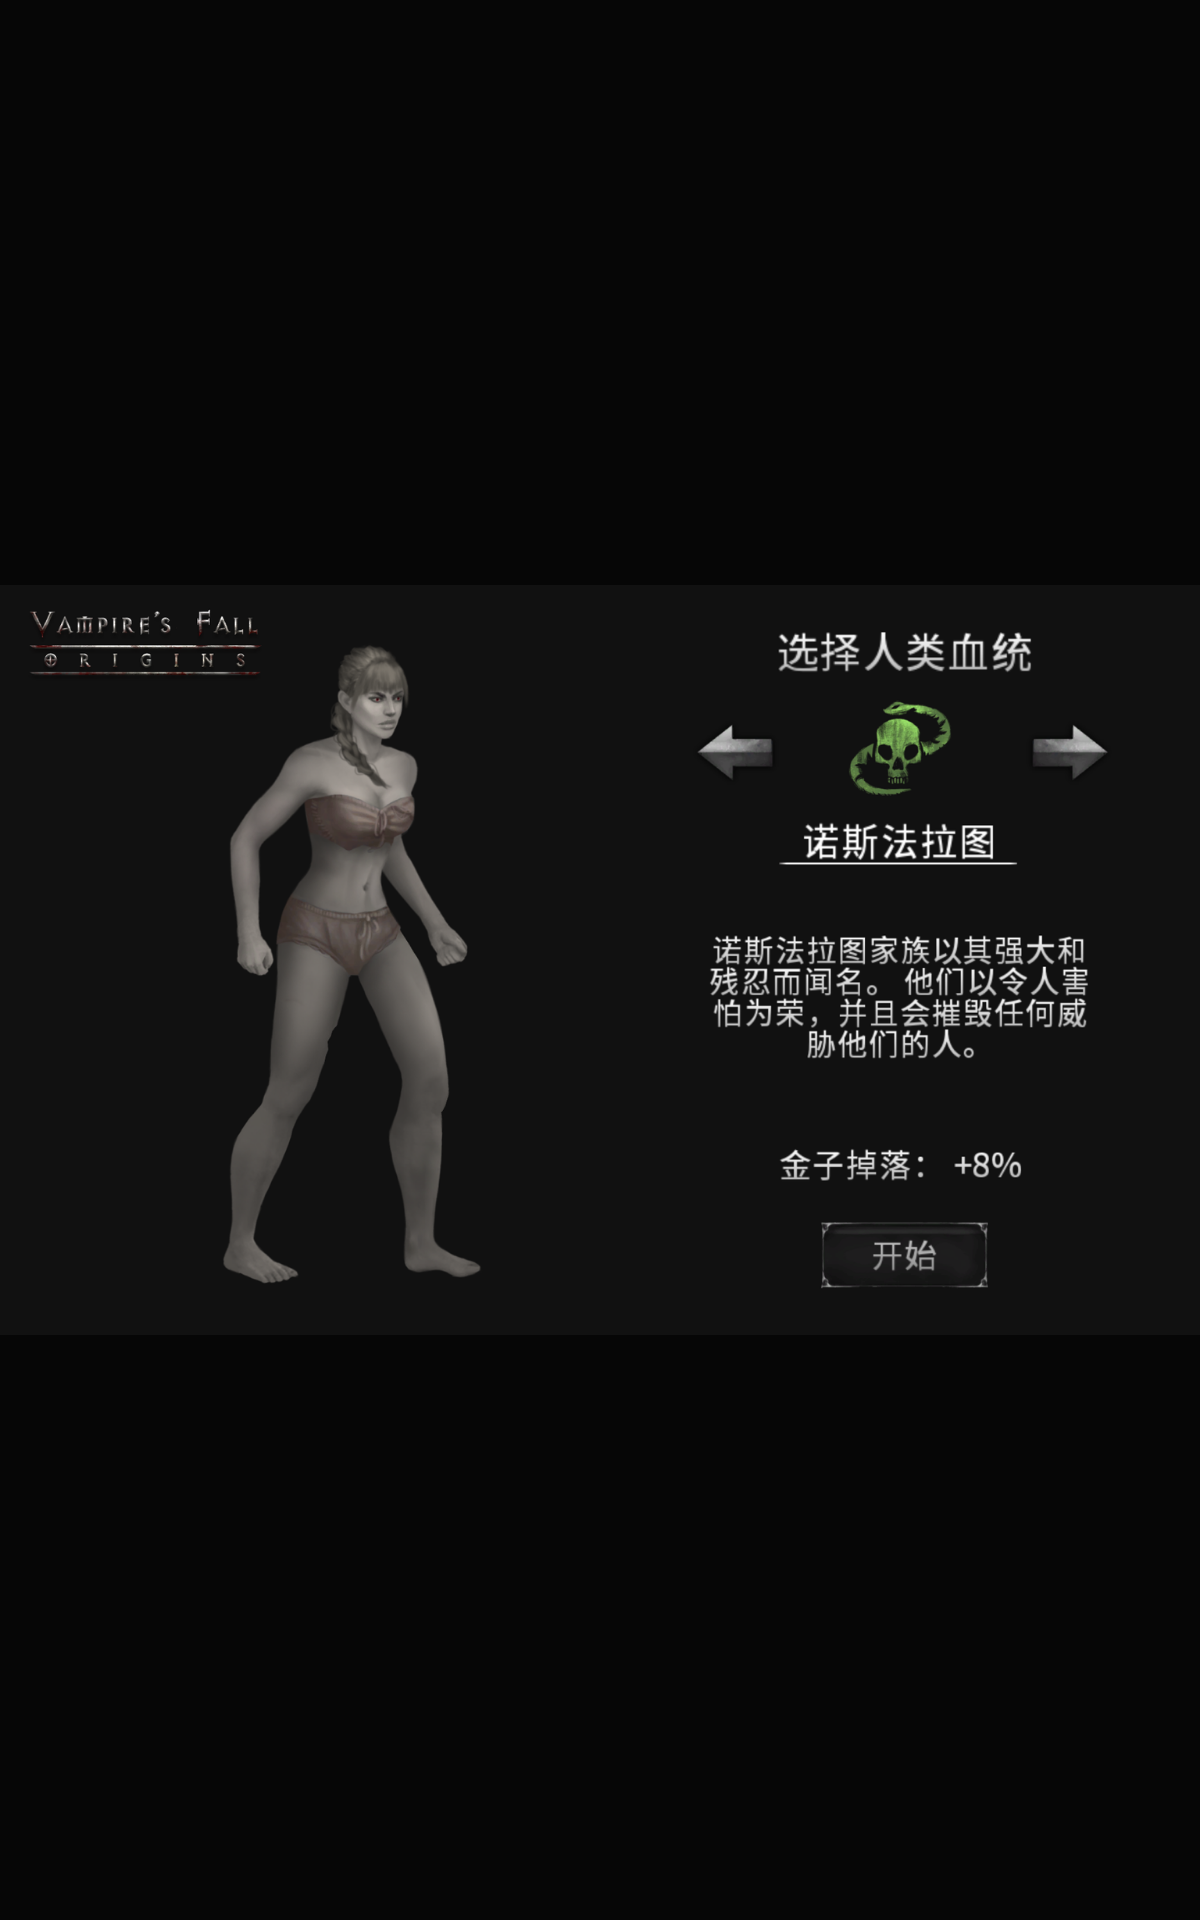 Screenshot 1: 吸血鬼之殇:起源 - 中世纪角色扮演游戏